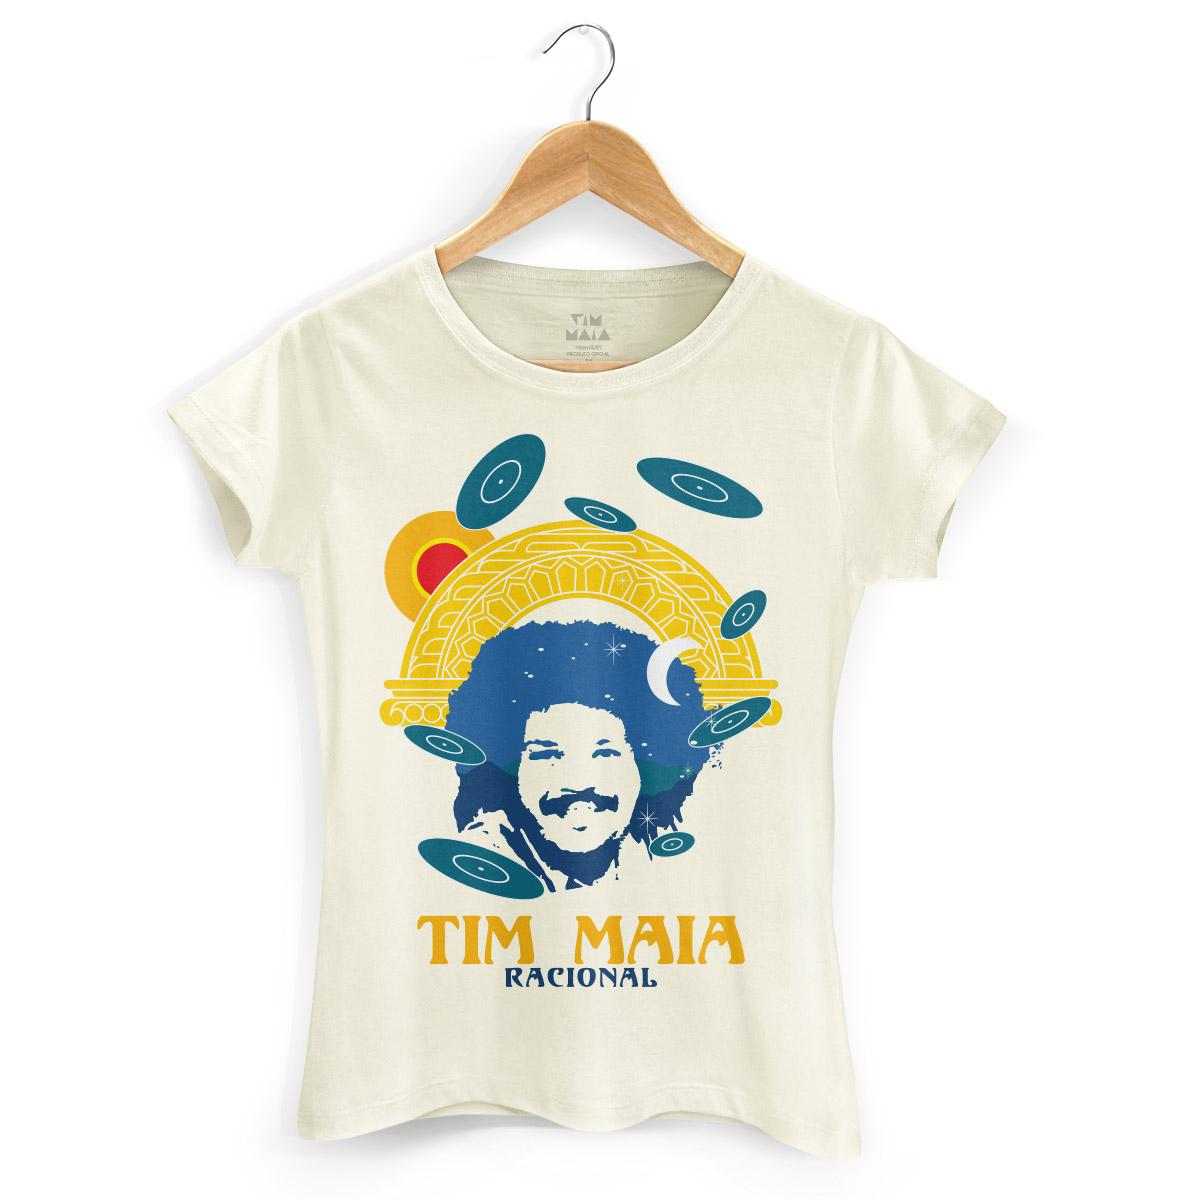 Camiseta Feminina Tim Maia Racional